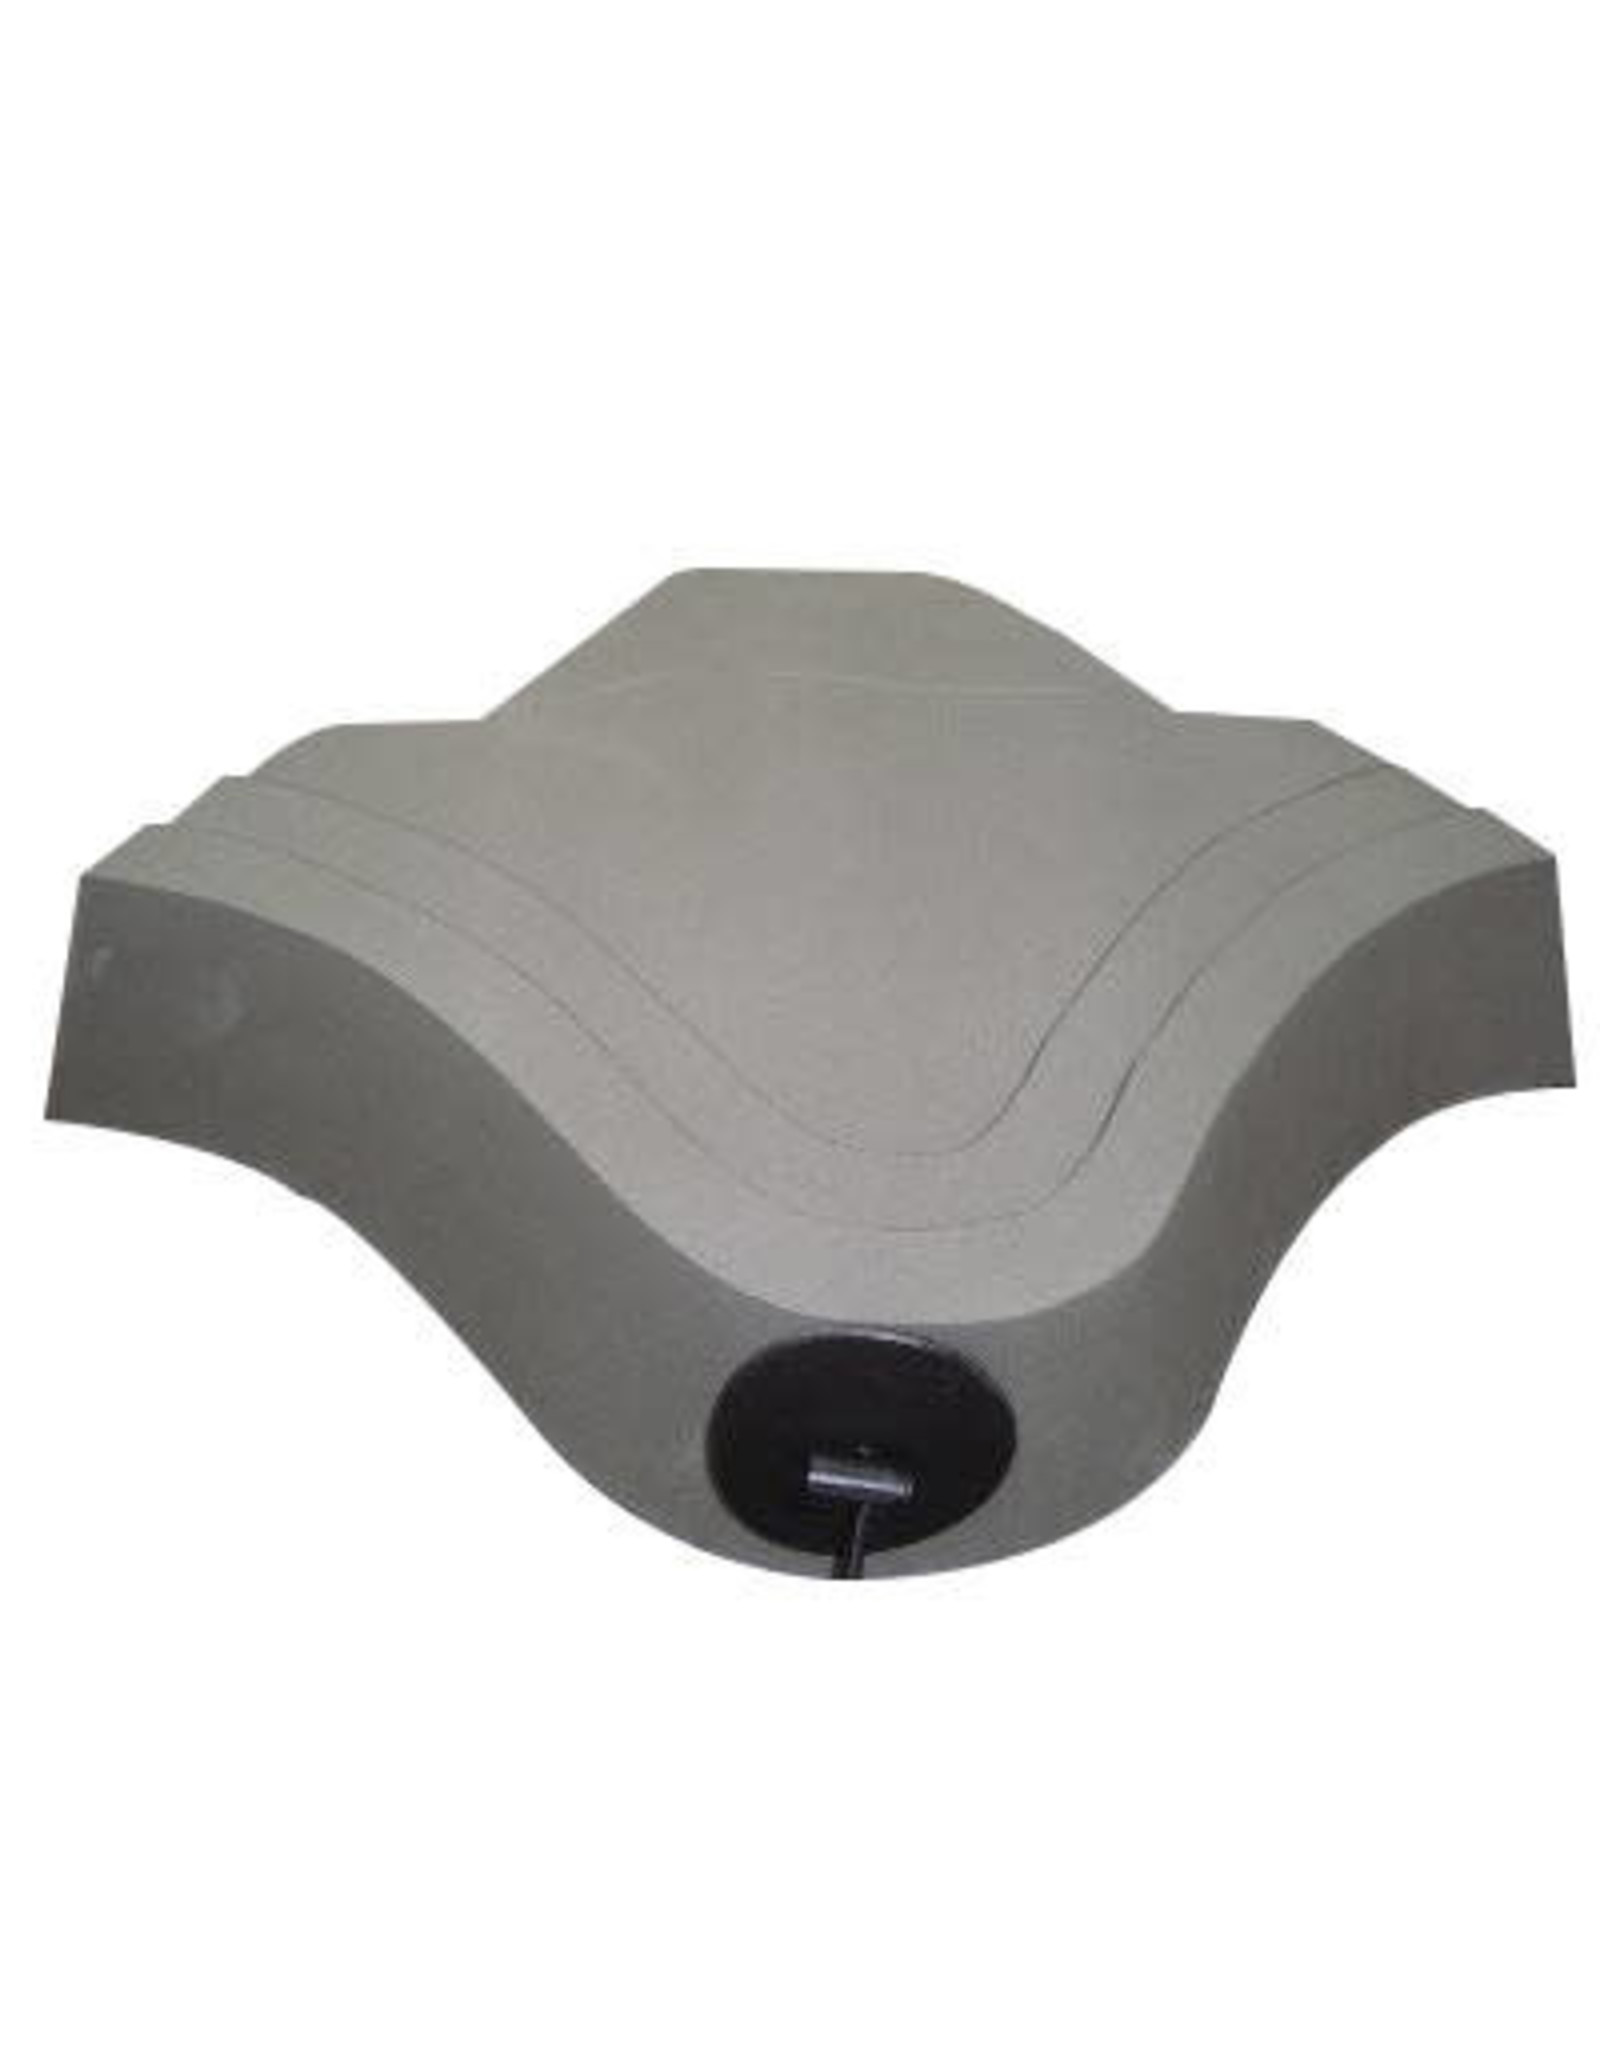 Jackson Kayaks Jackson Acc.  cale pieds ajustable - JK Foam Foot Block System